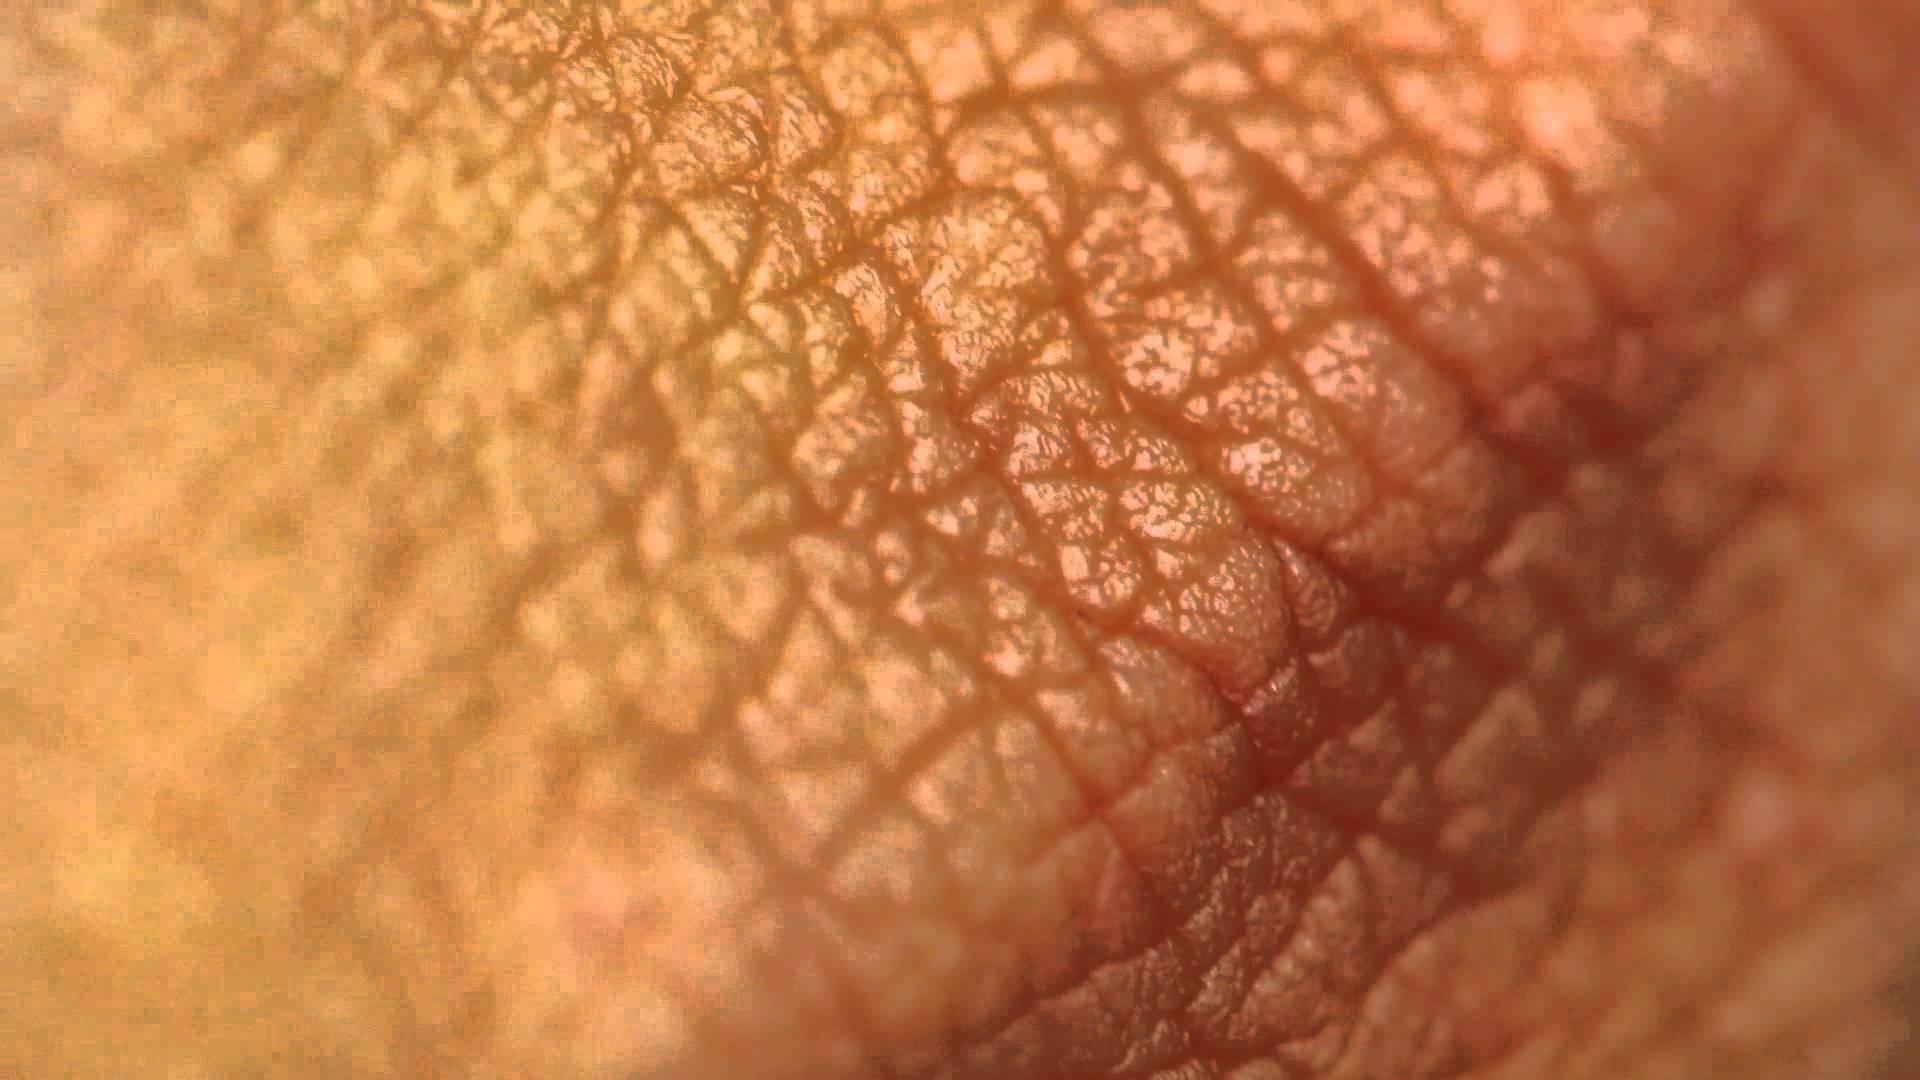 Una piccola stampante 3D per guarire le ferite cutanee